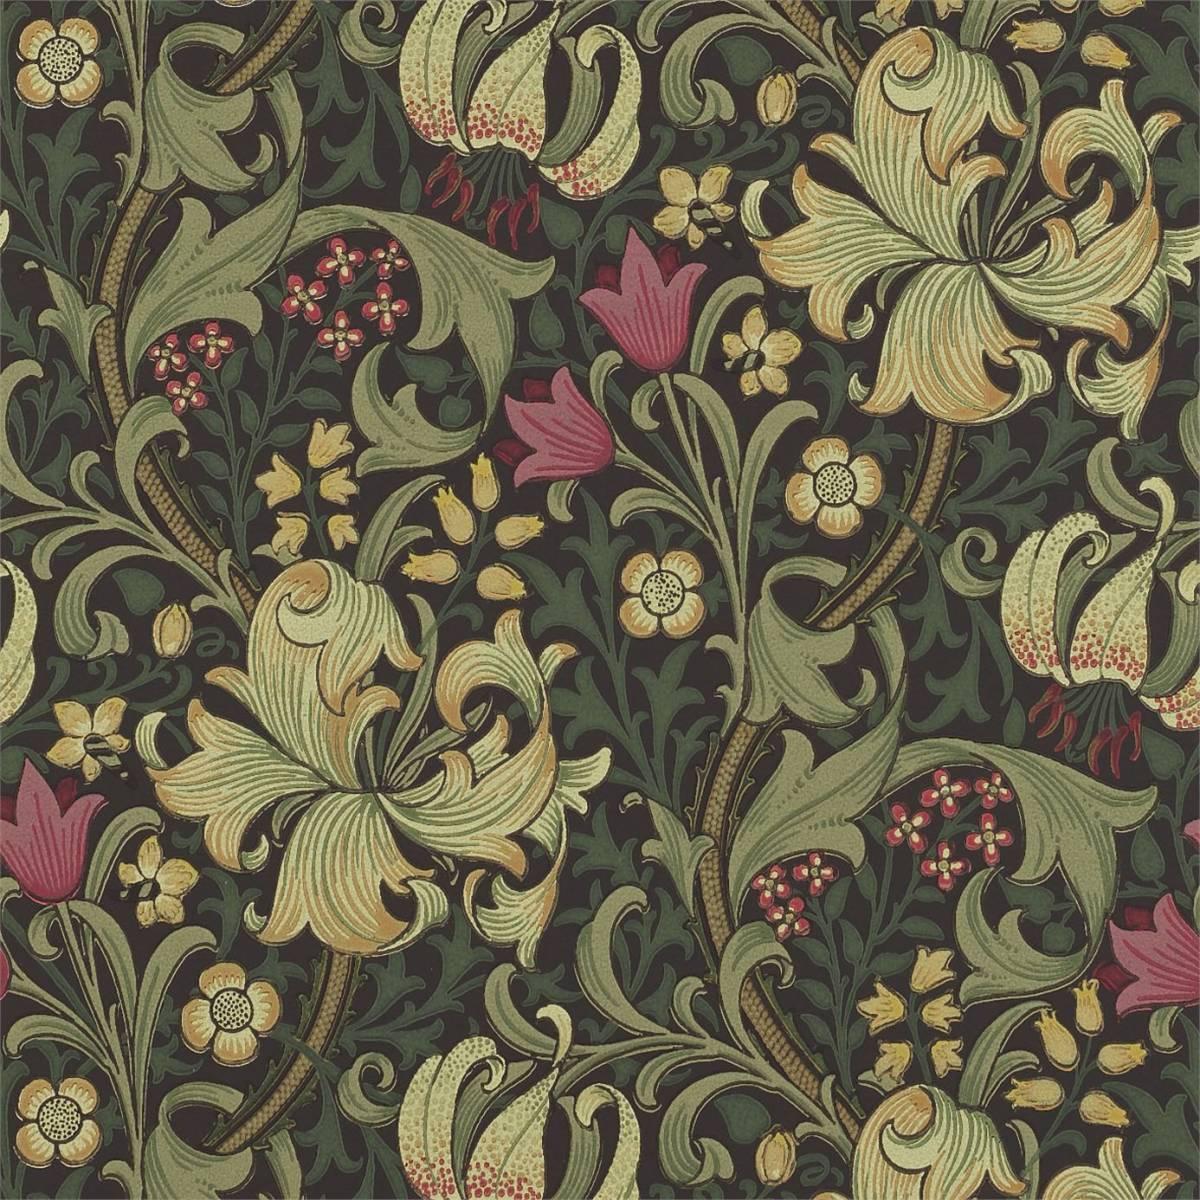 William Morris Wallpaper: Charcoal/Olive (210403)